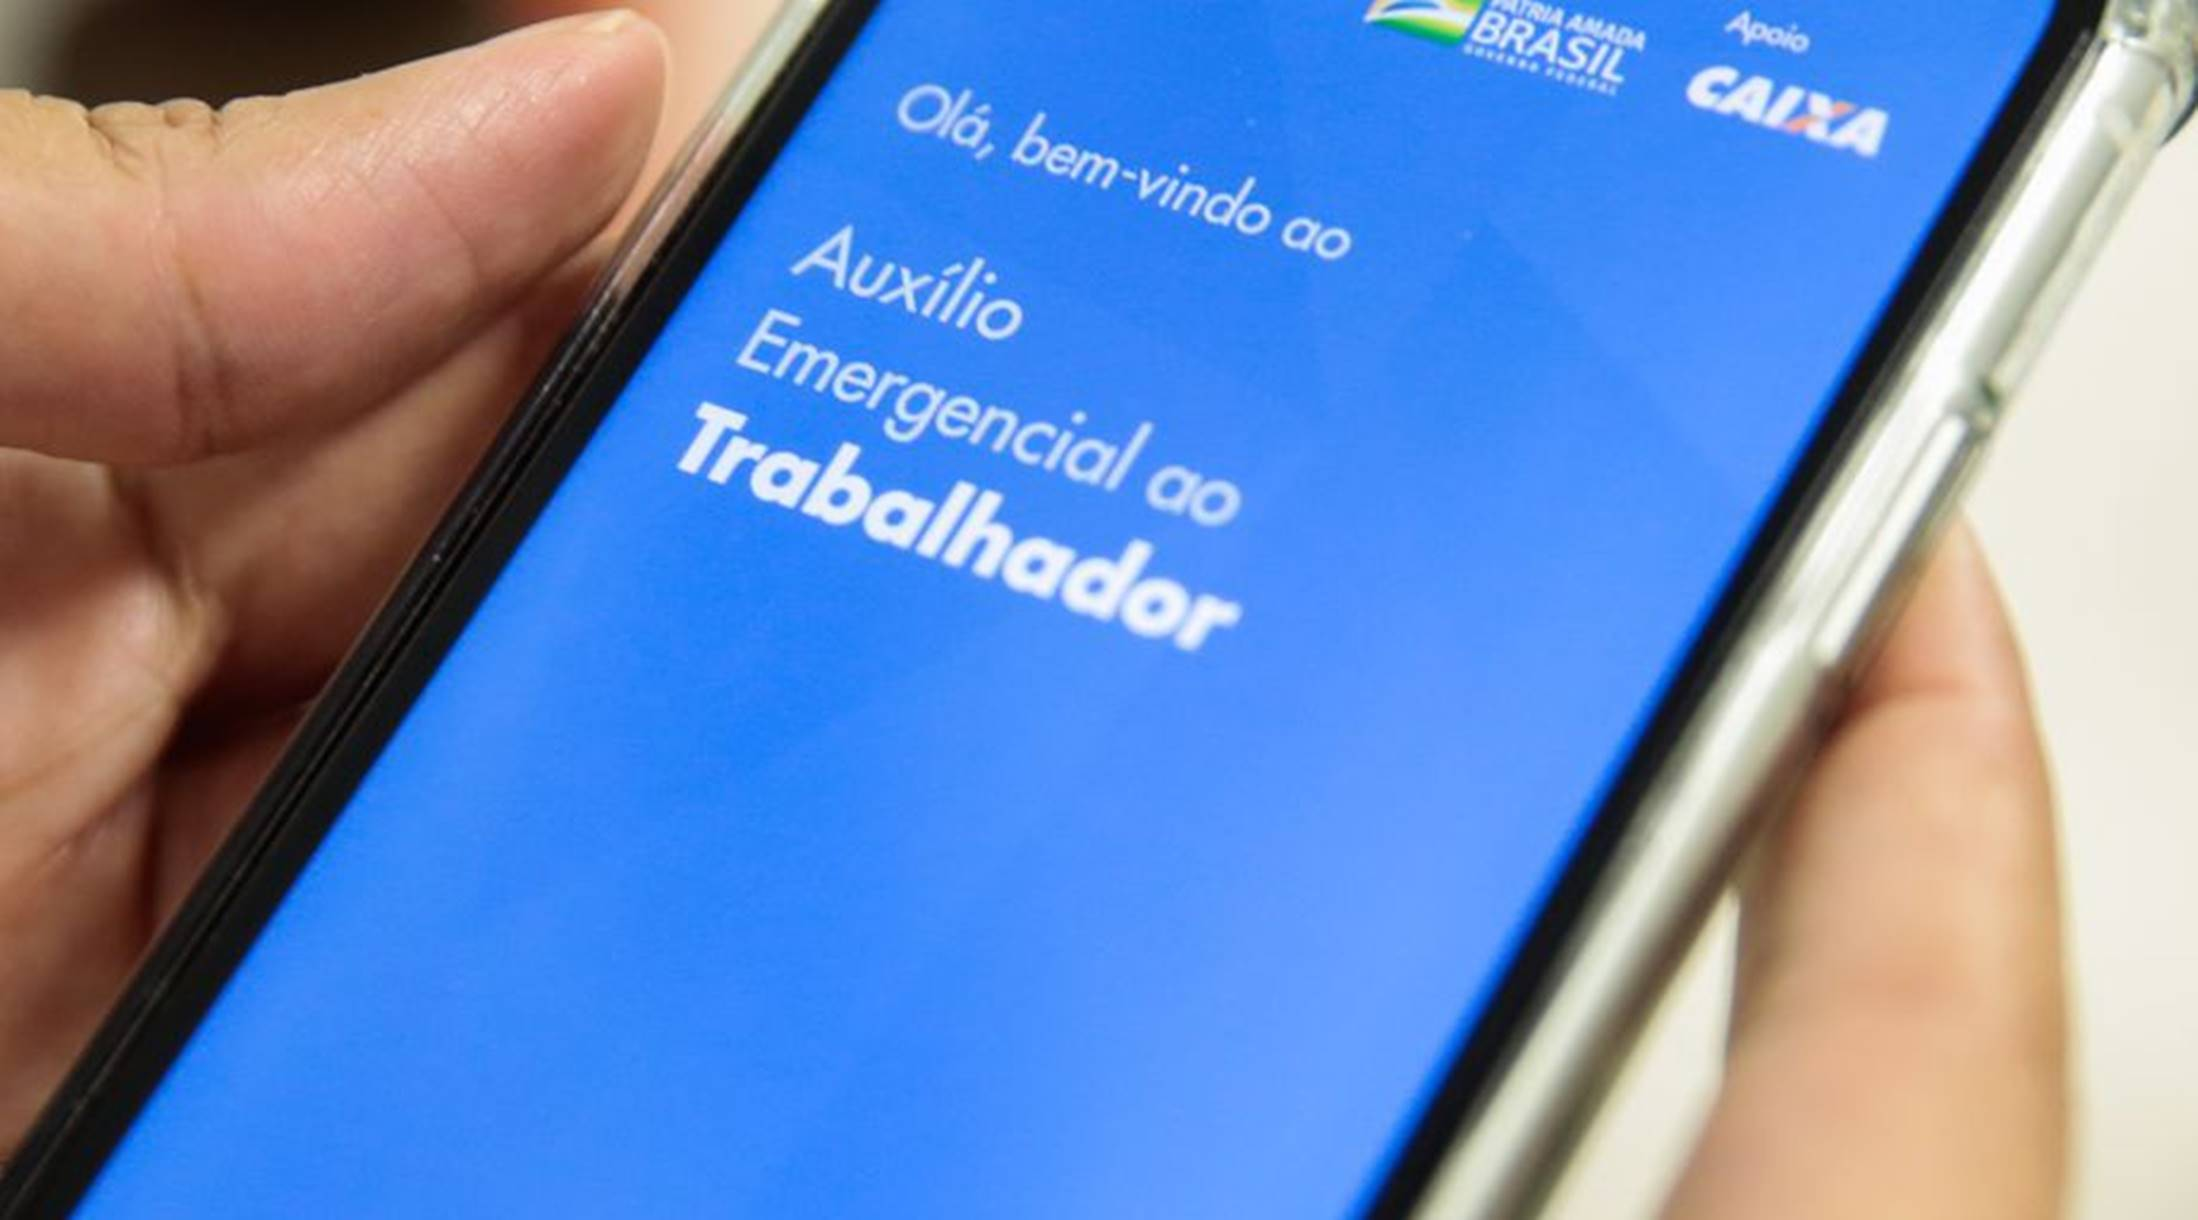 Auxílio Emergencial app